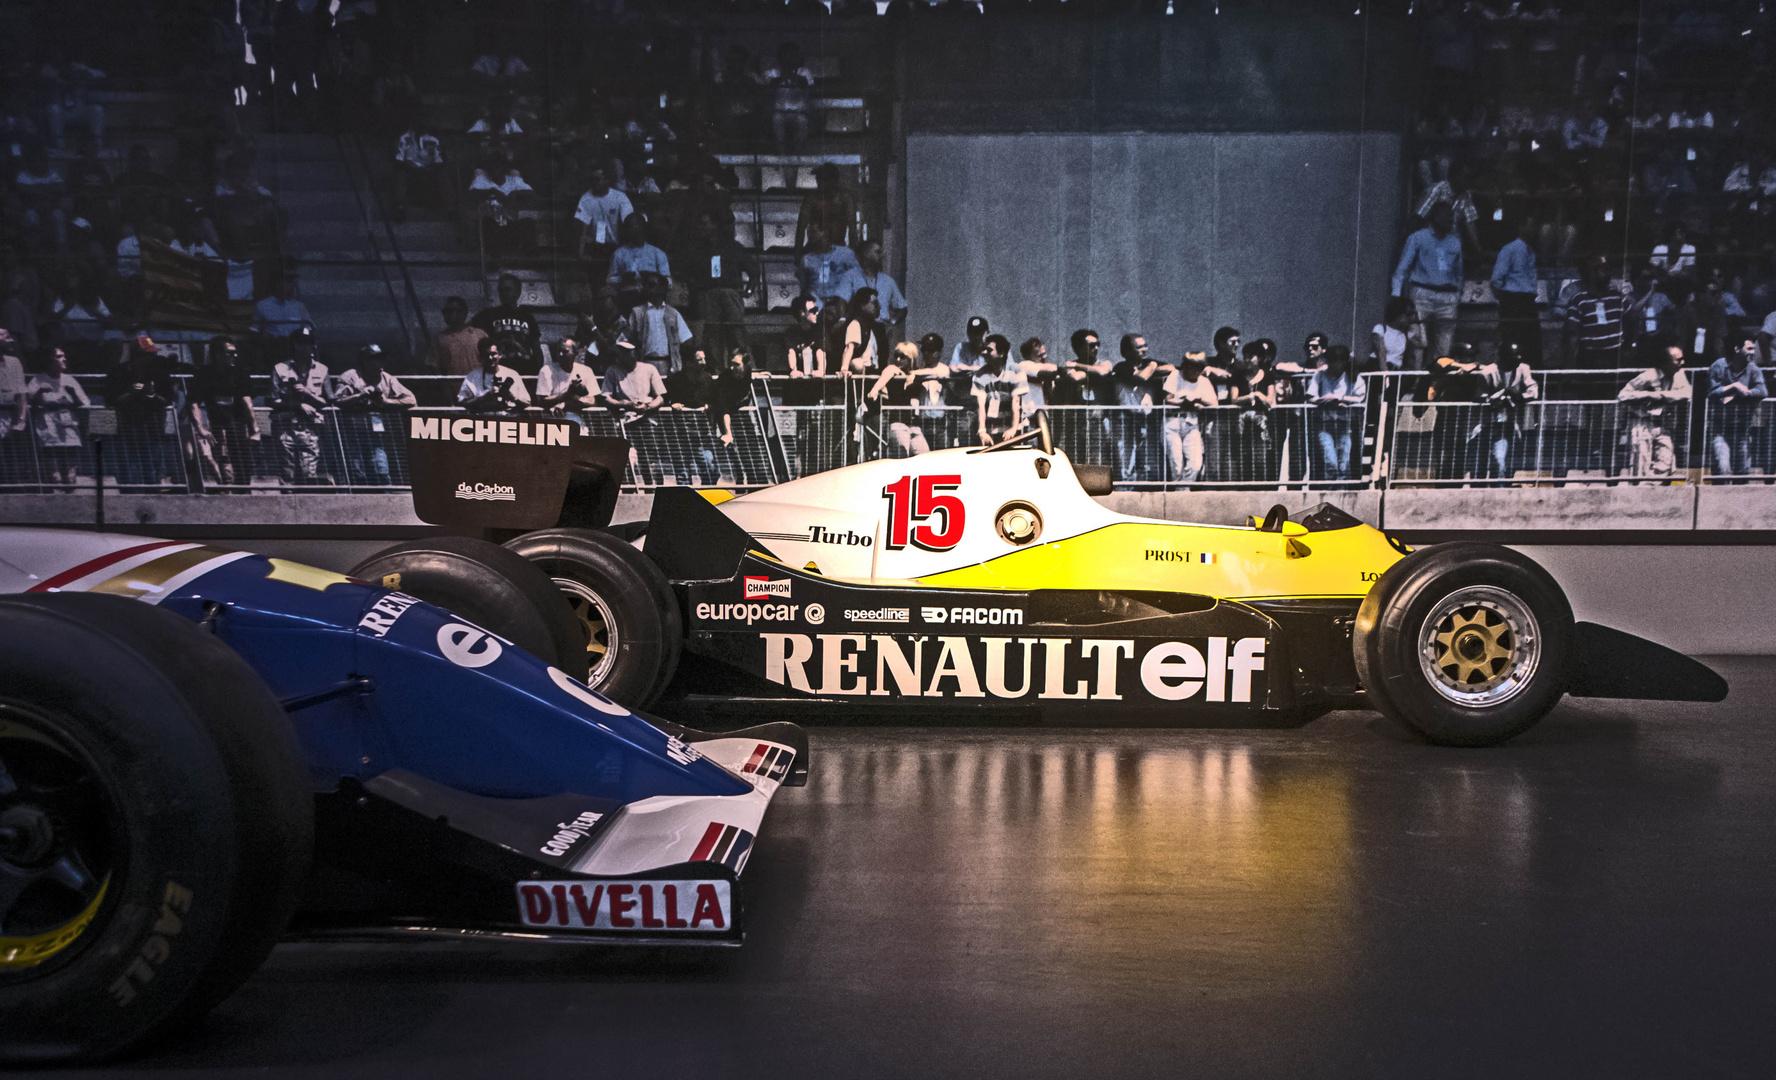 Alain Prost Formula 1 Racecar